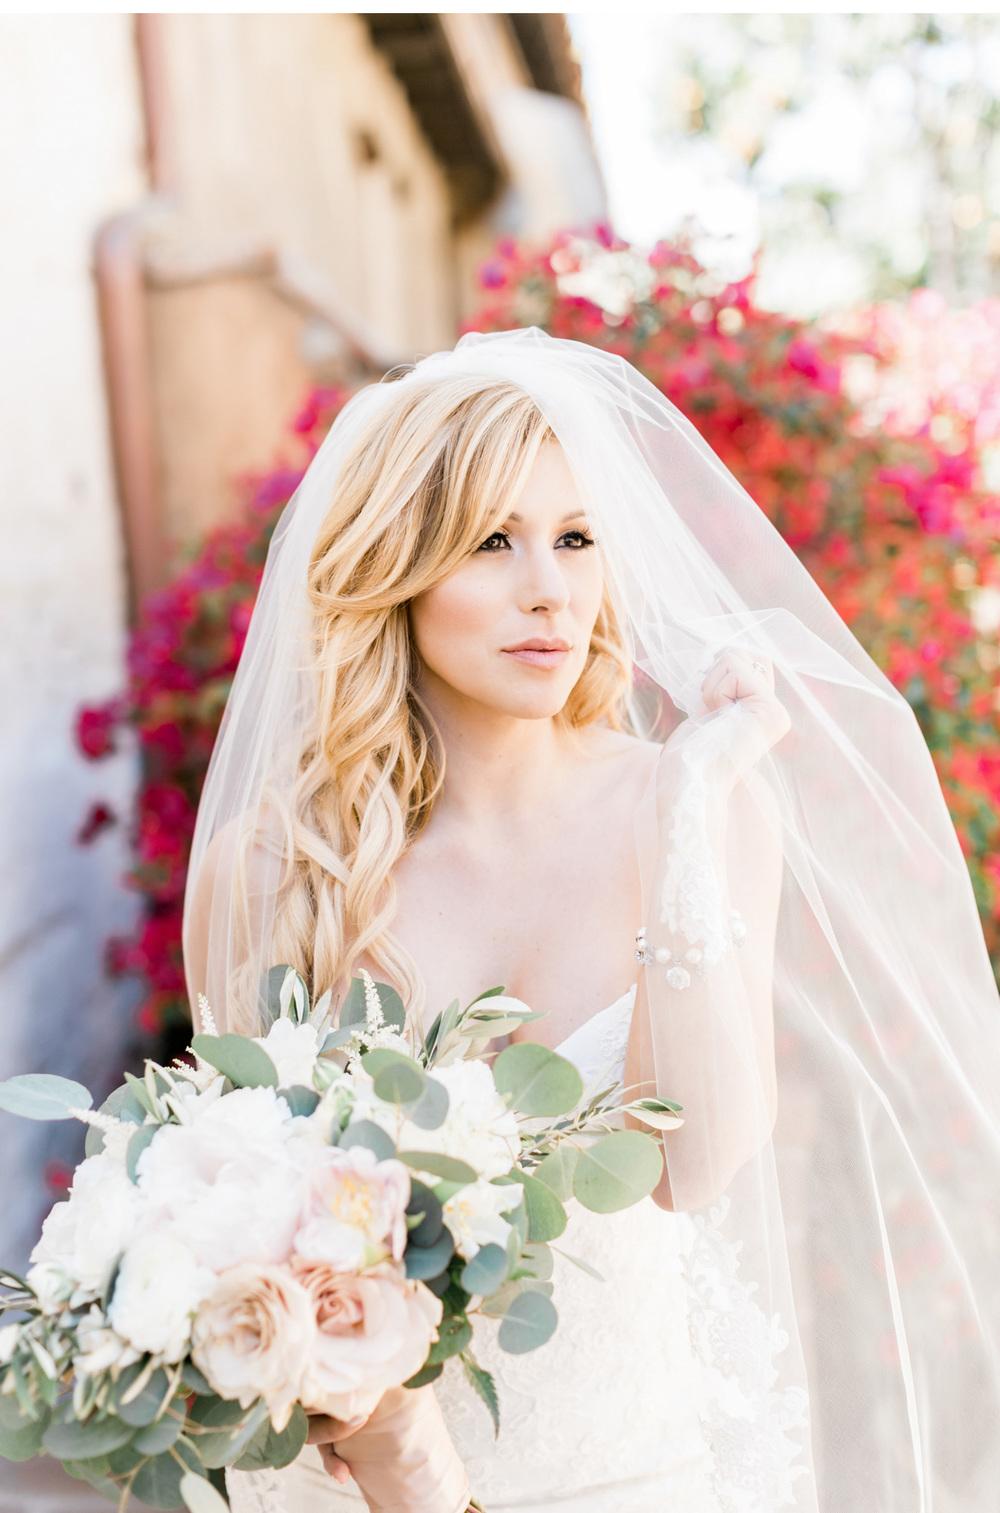 San-Juan-Capistrano-Wedding-Style-Me-Pretty-Natalie-Schutt-Photography_09.jpg